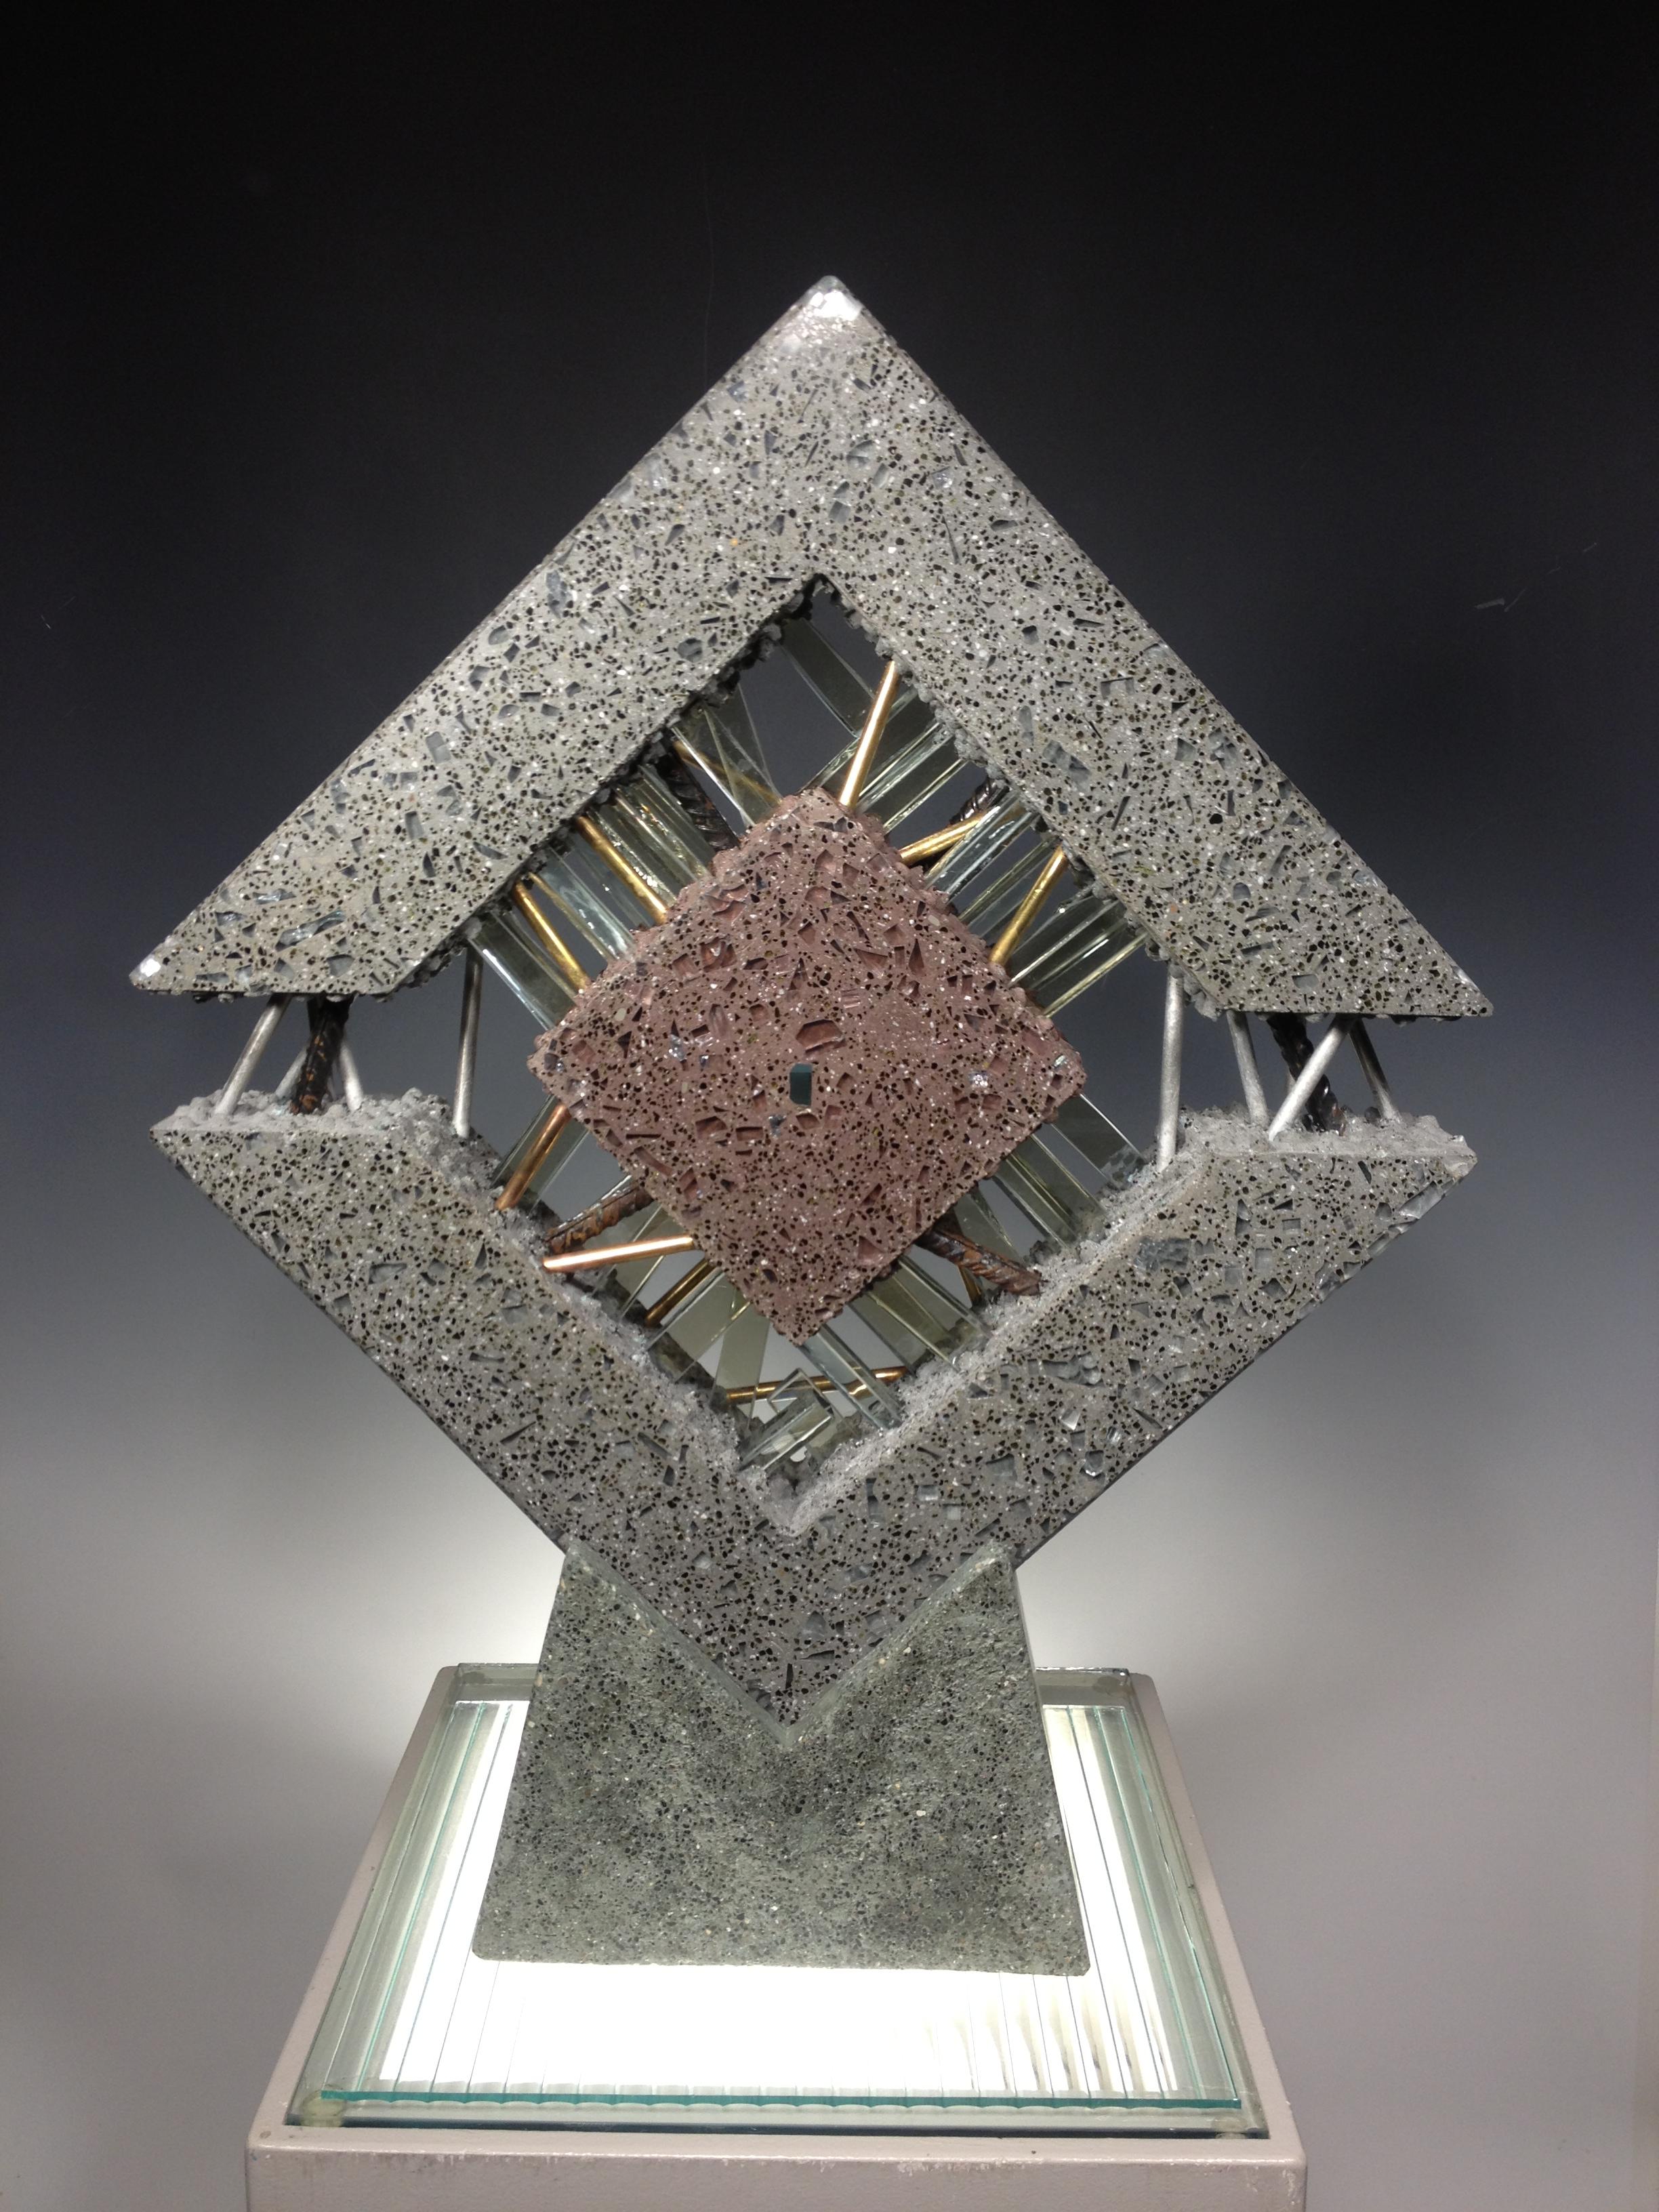 Polished Concrete Glass And Metal Michael Eddy Artist